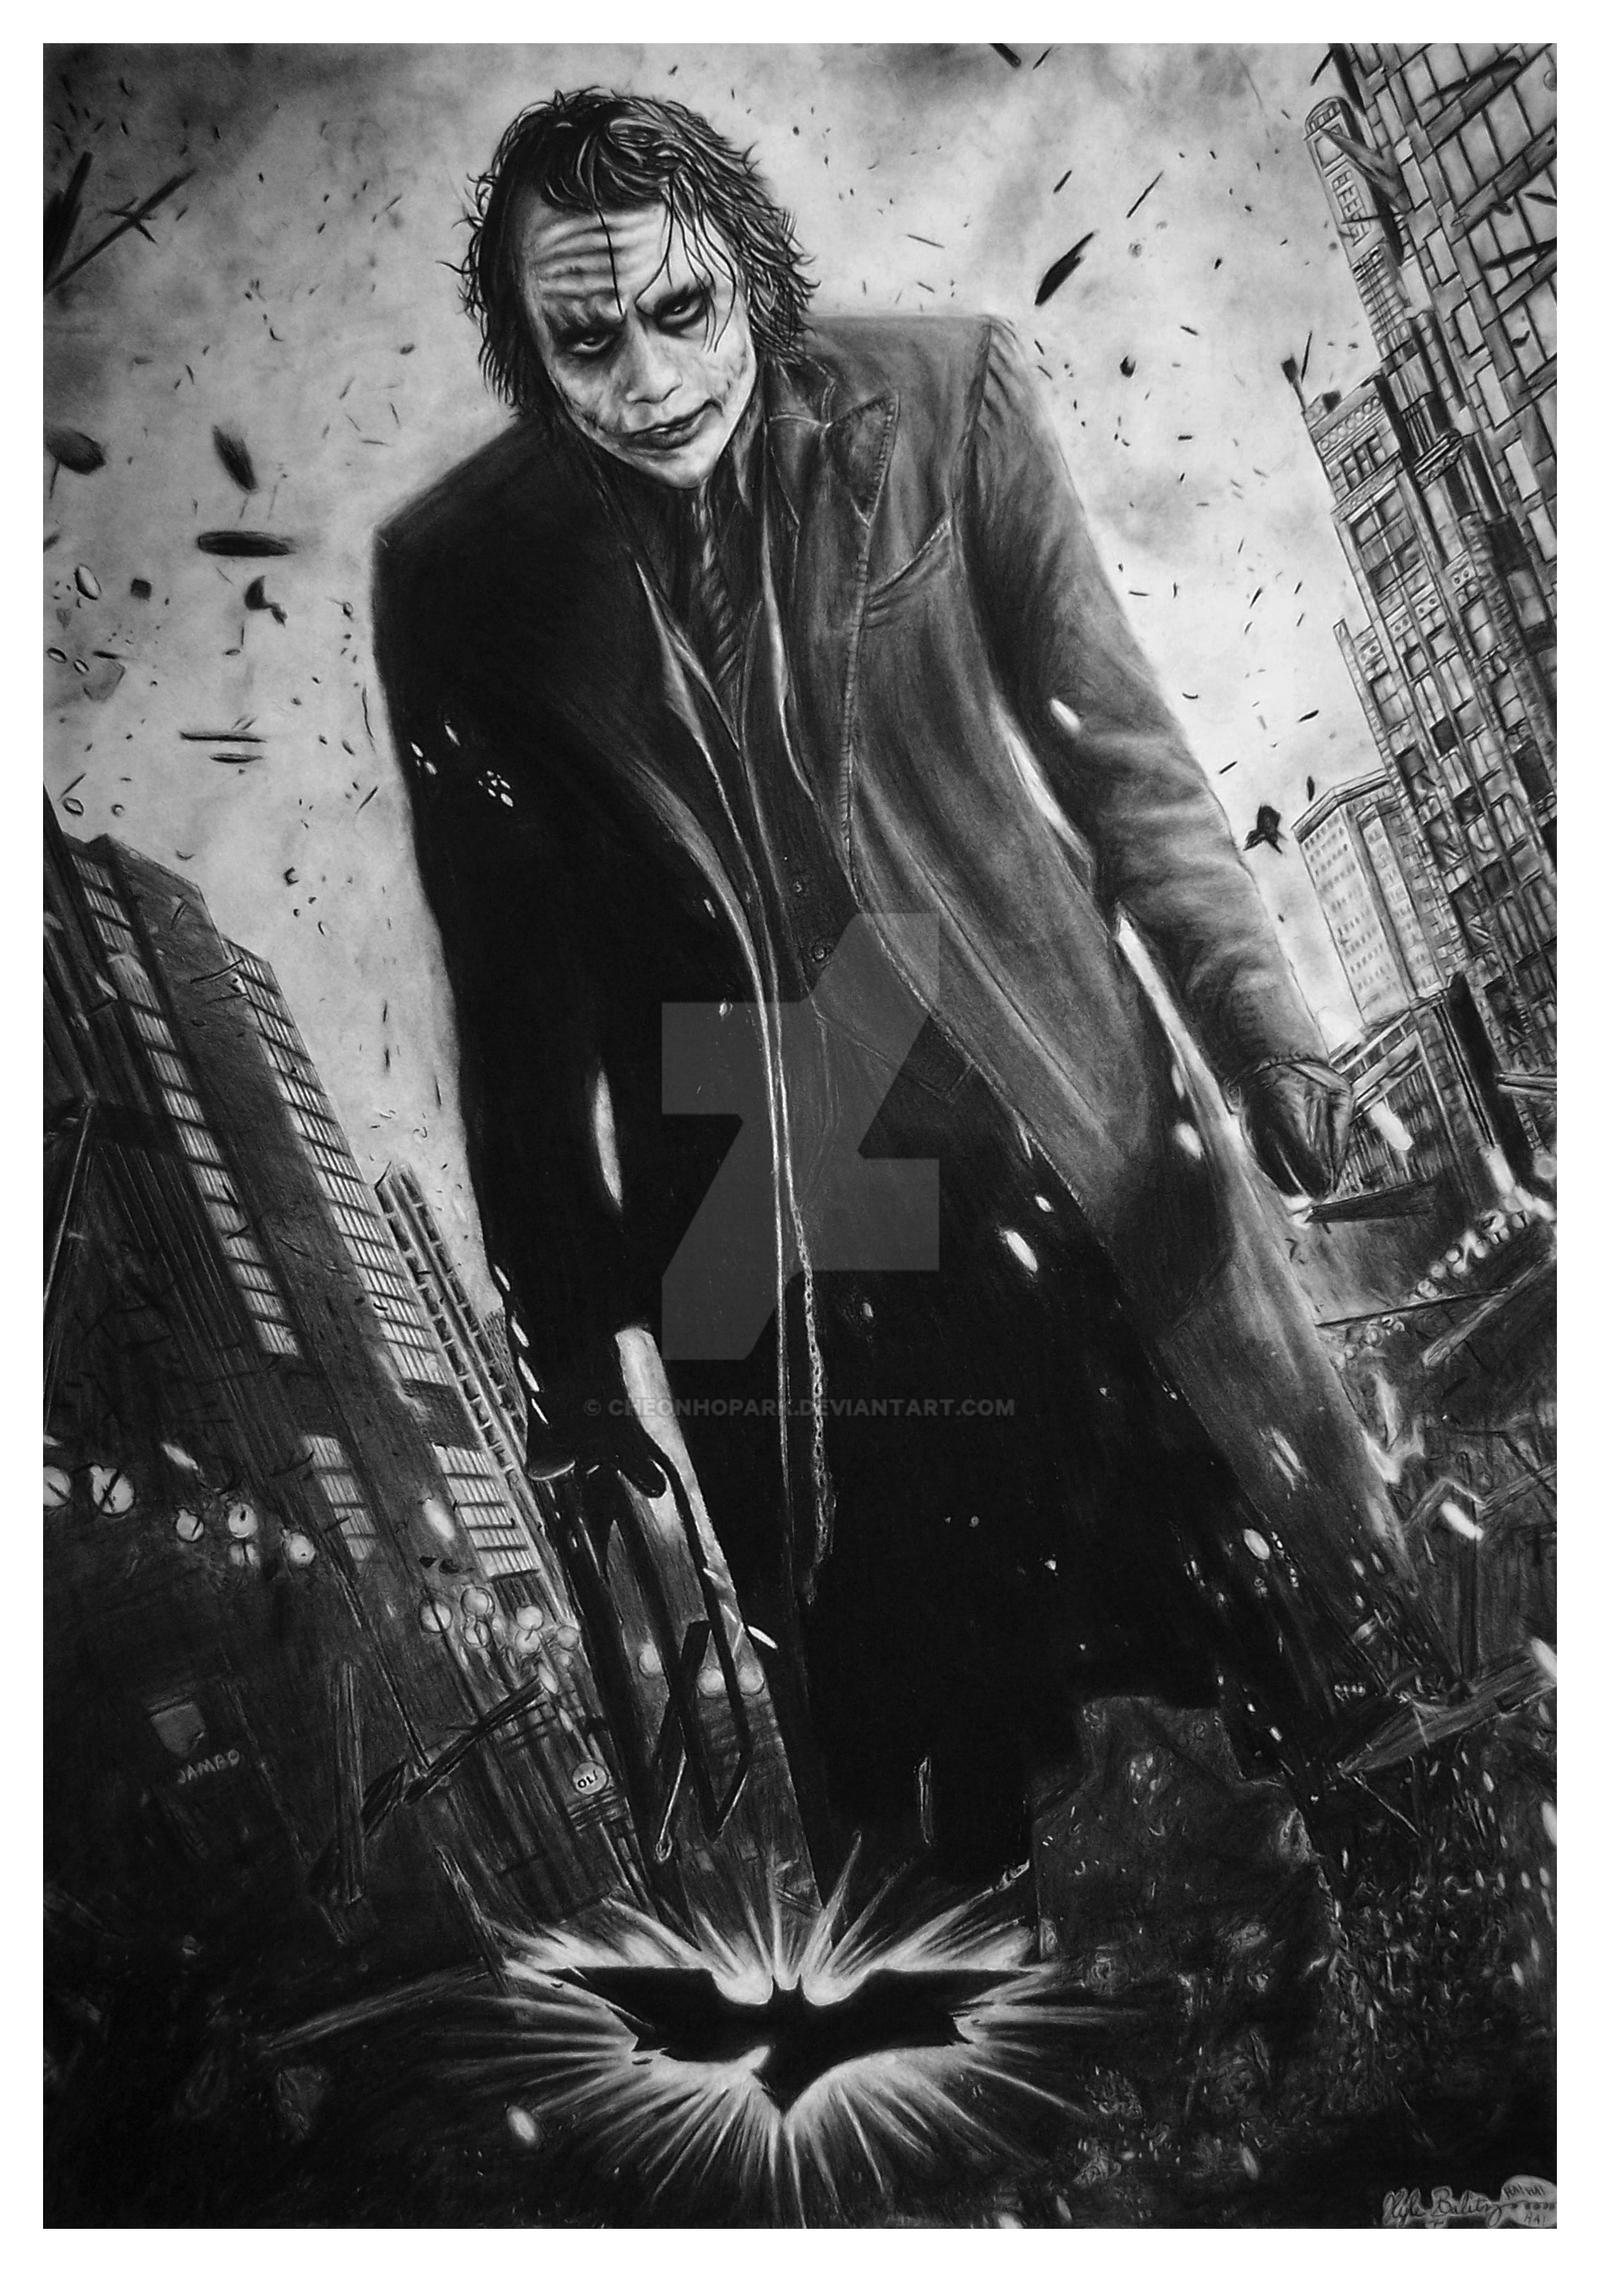 The Joker - The Dark Knight by CheonHoPark